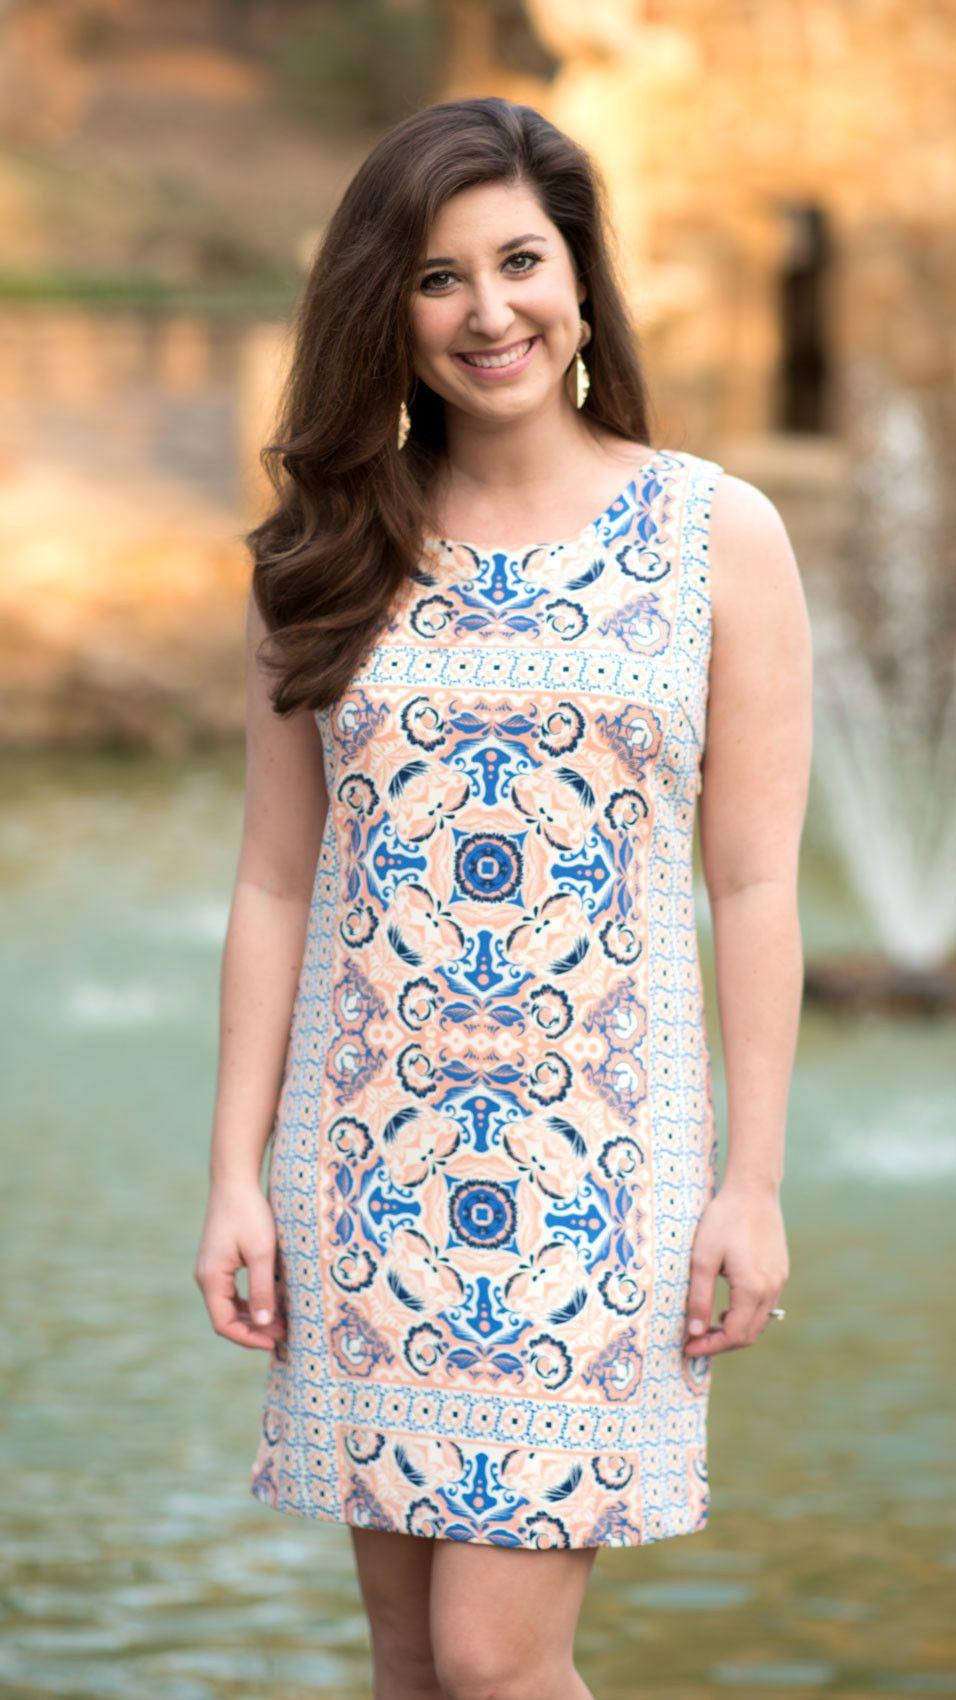 Sunday Brunch Dress – I Do Declare Boutique